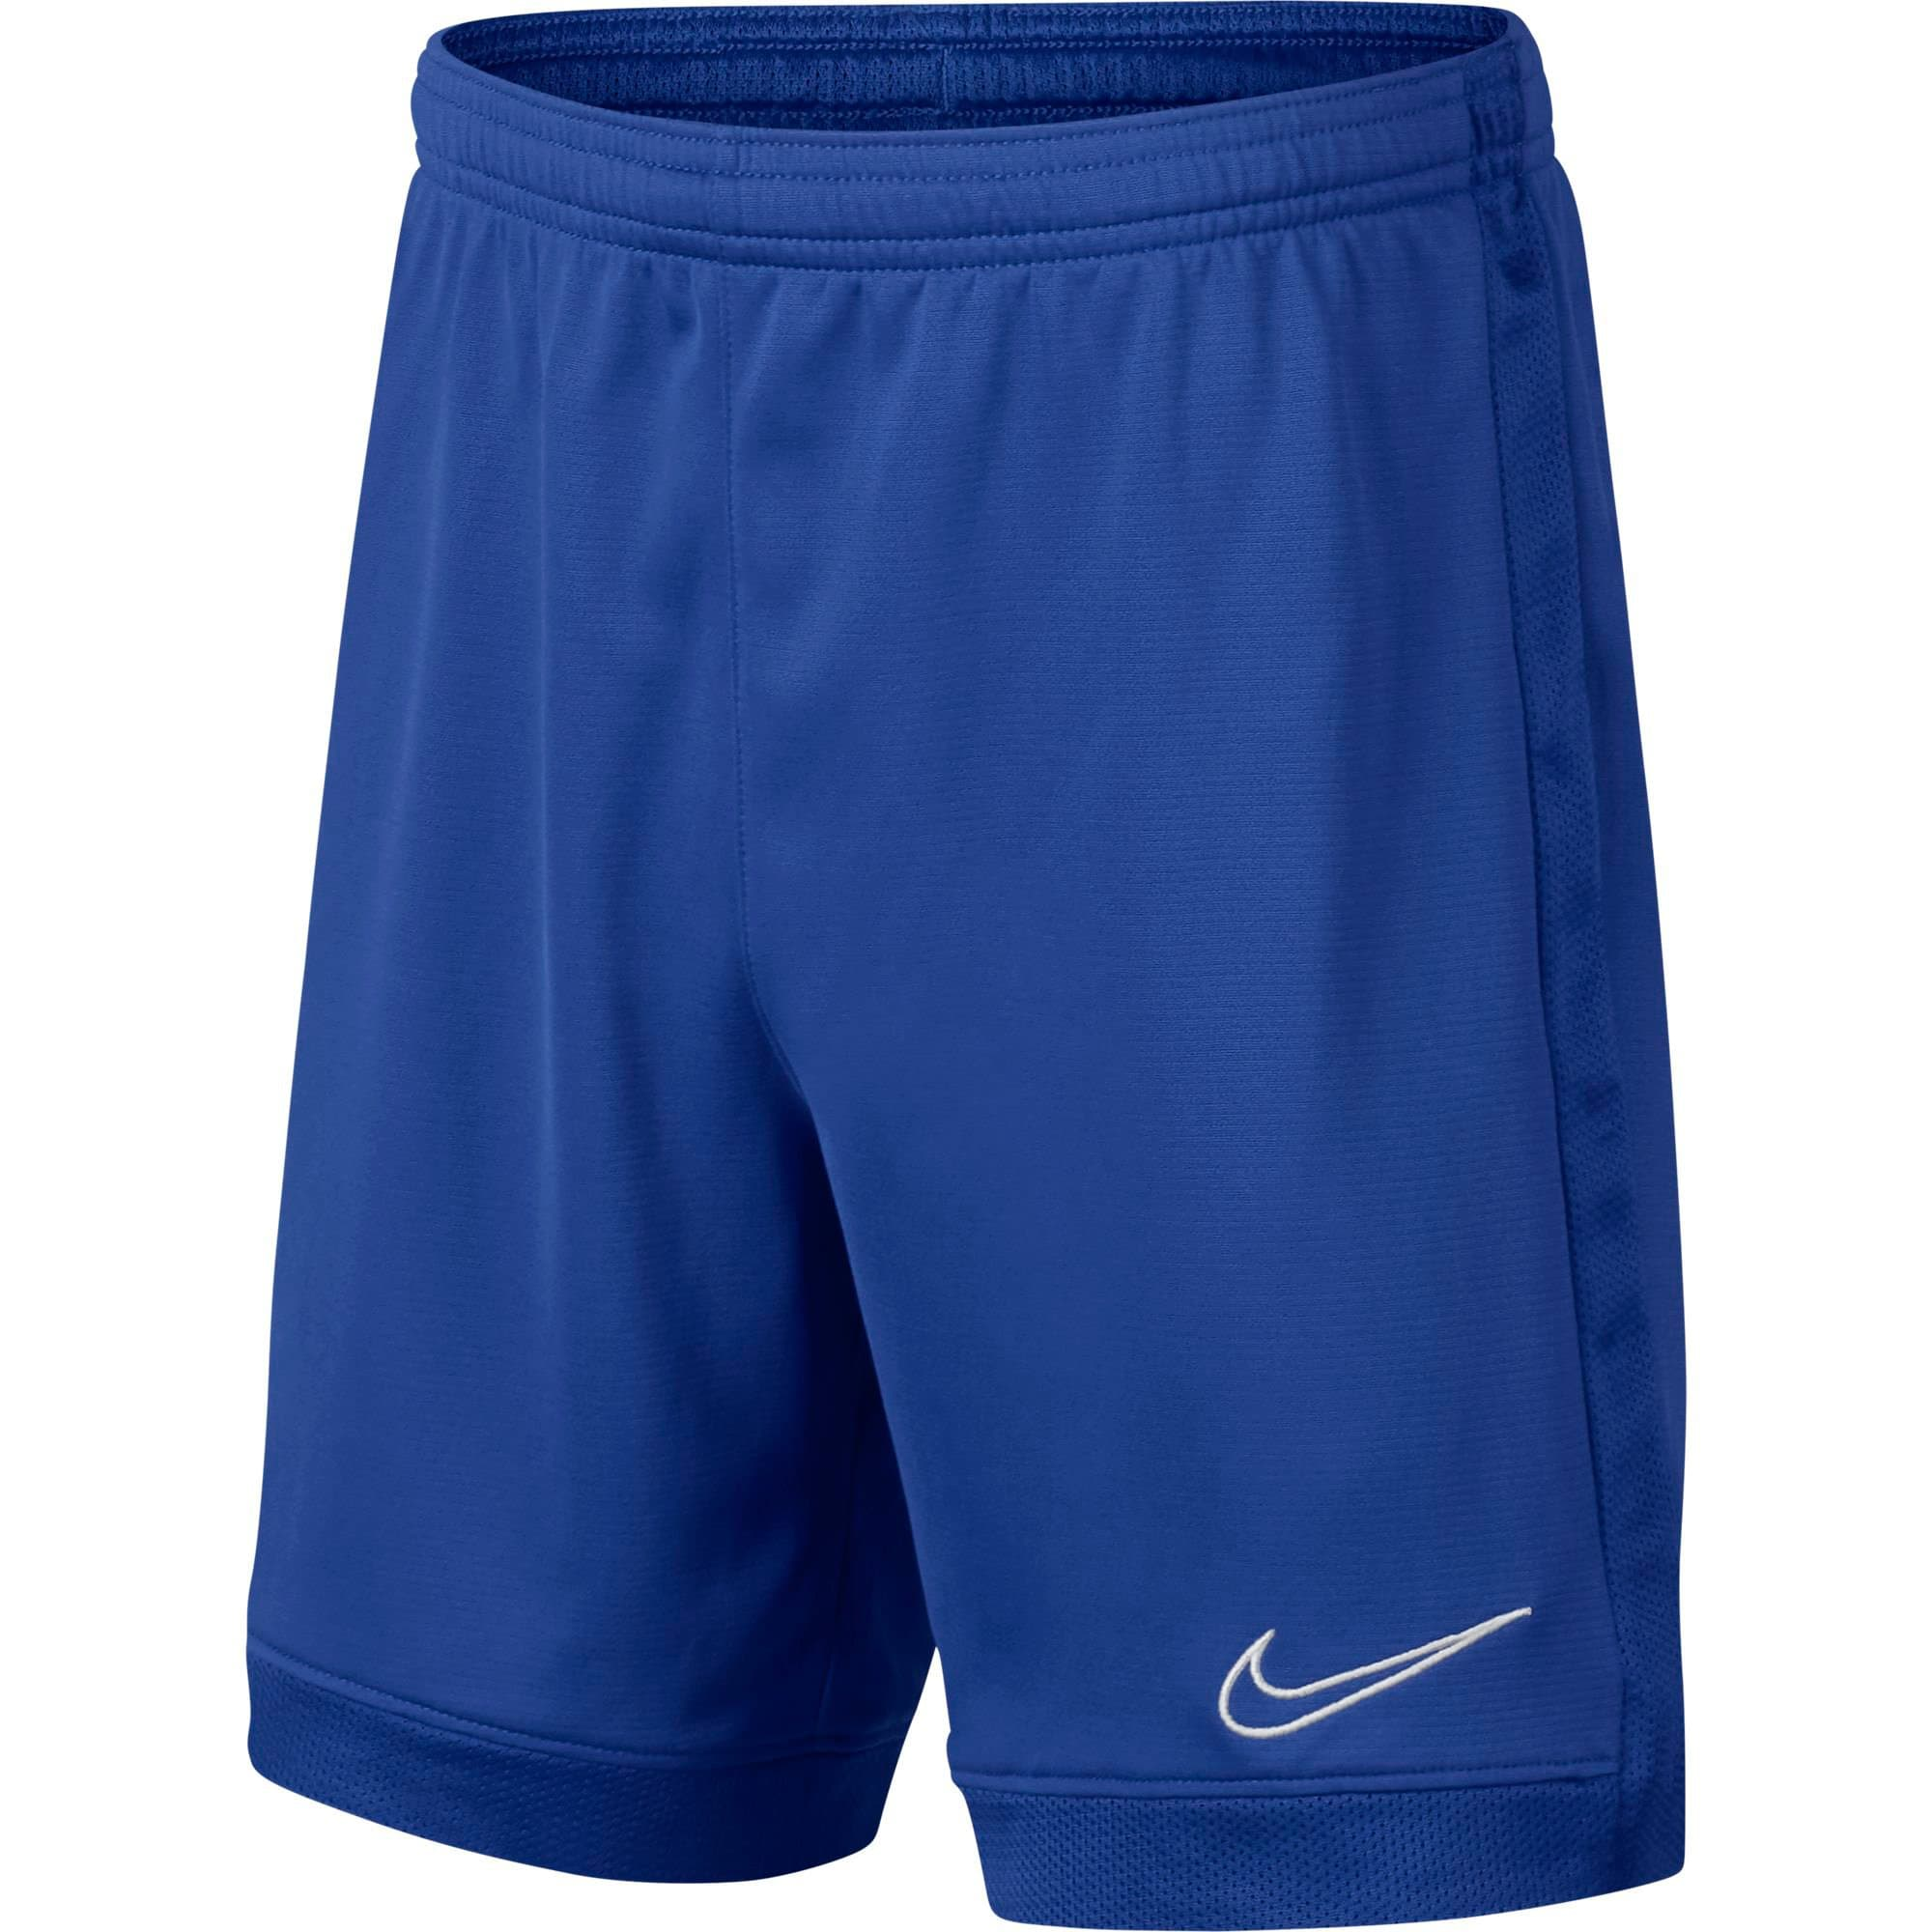 Nike Kids' Dri-FIT Academy Short Pantaloncini da calcio per bambini